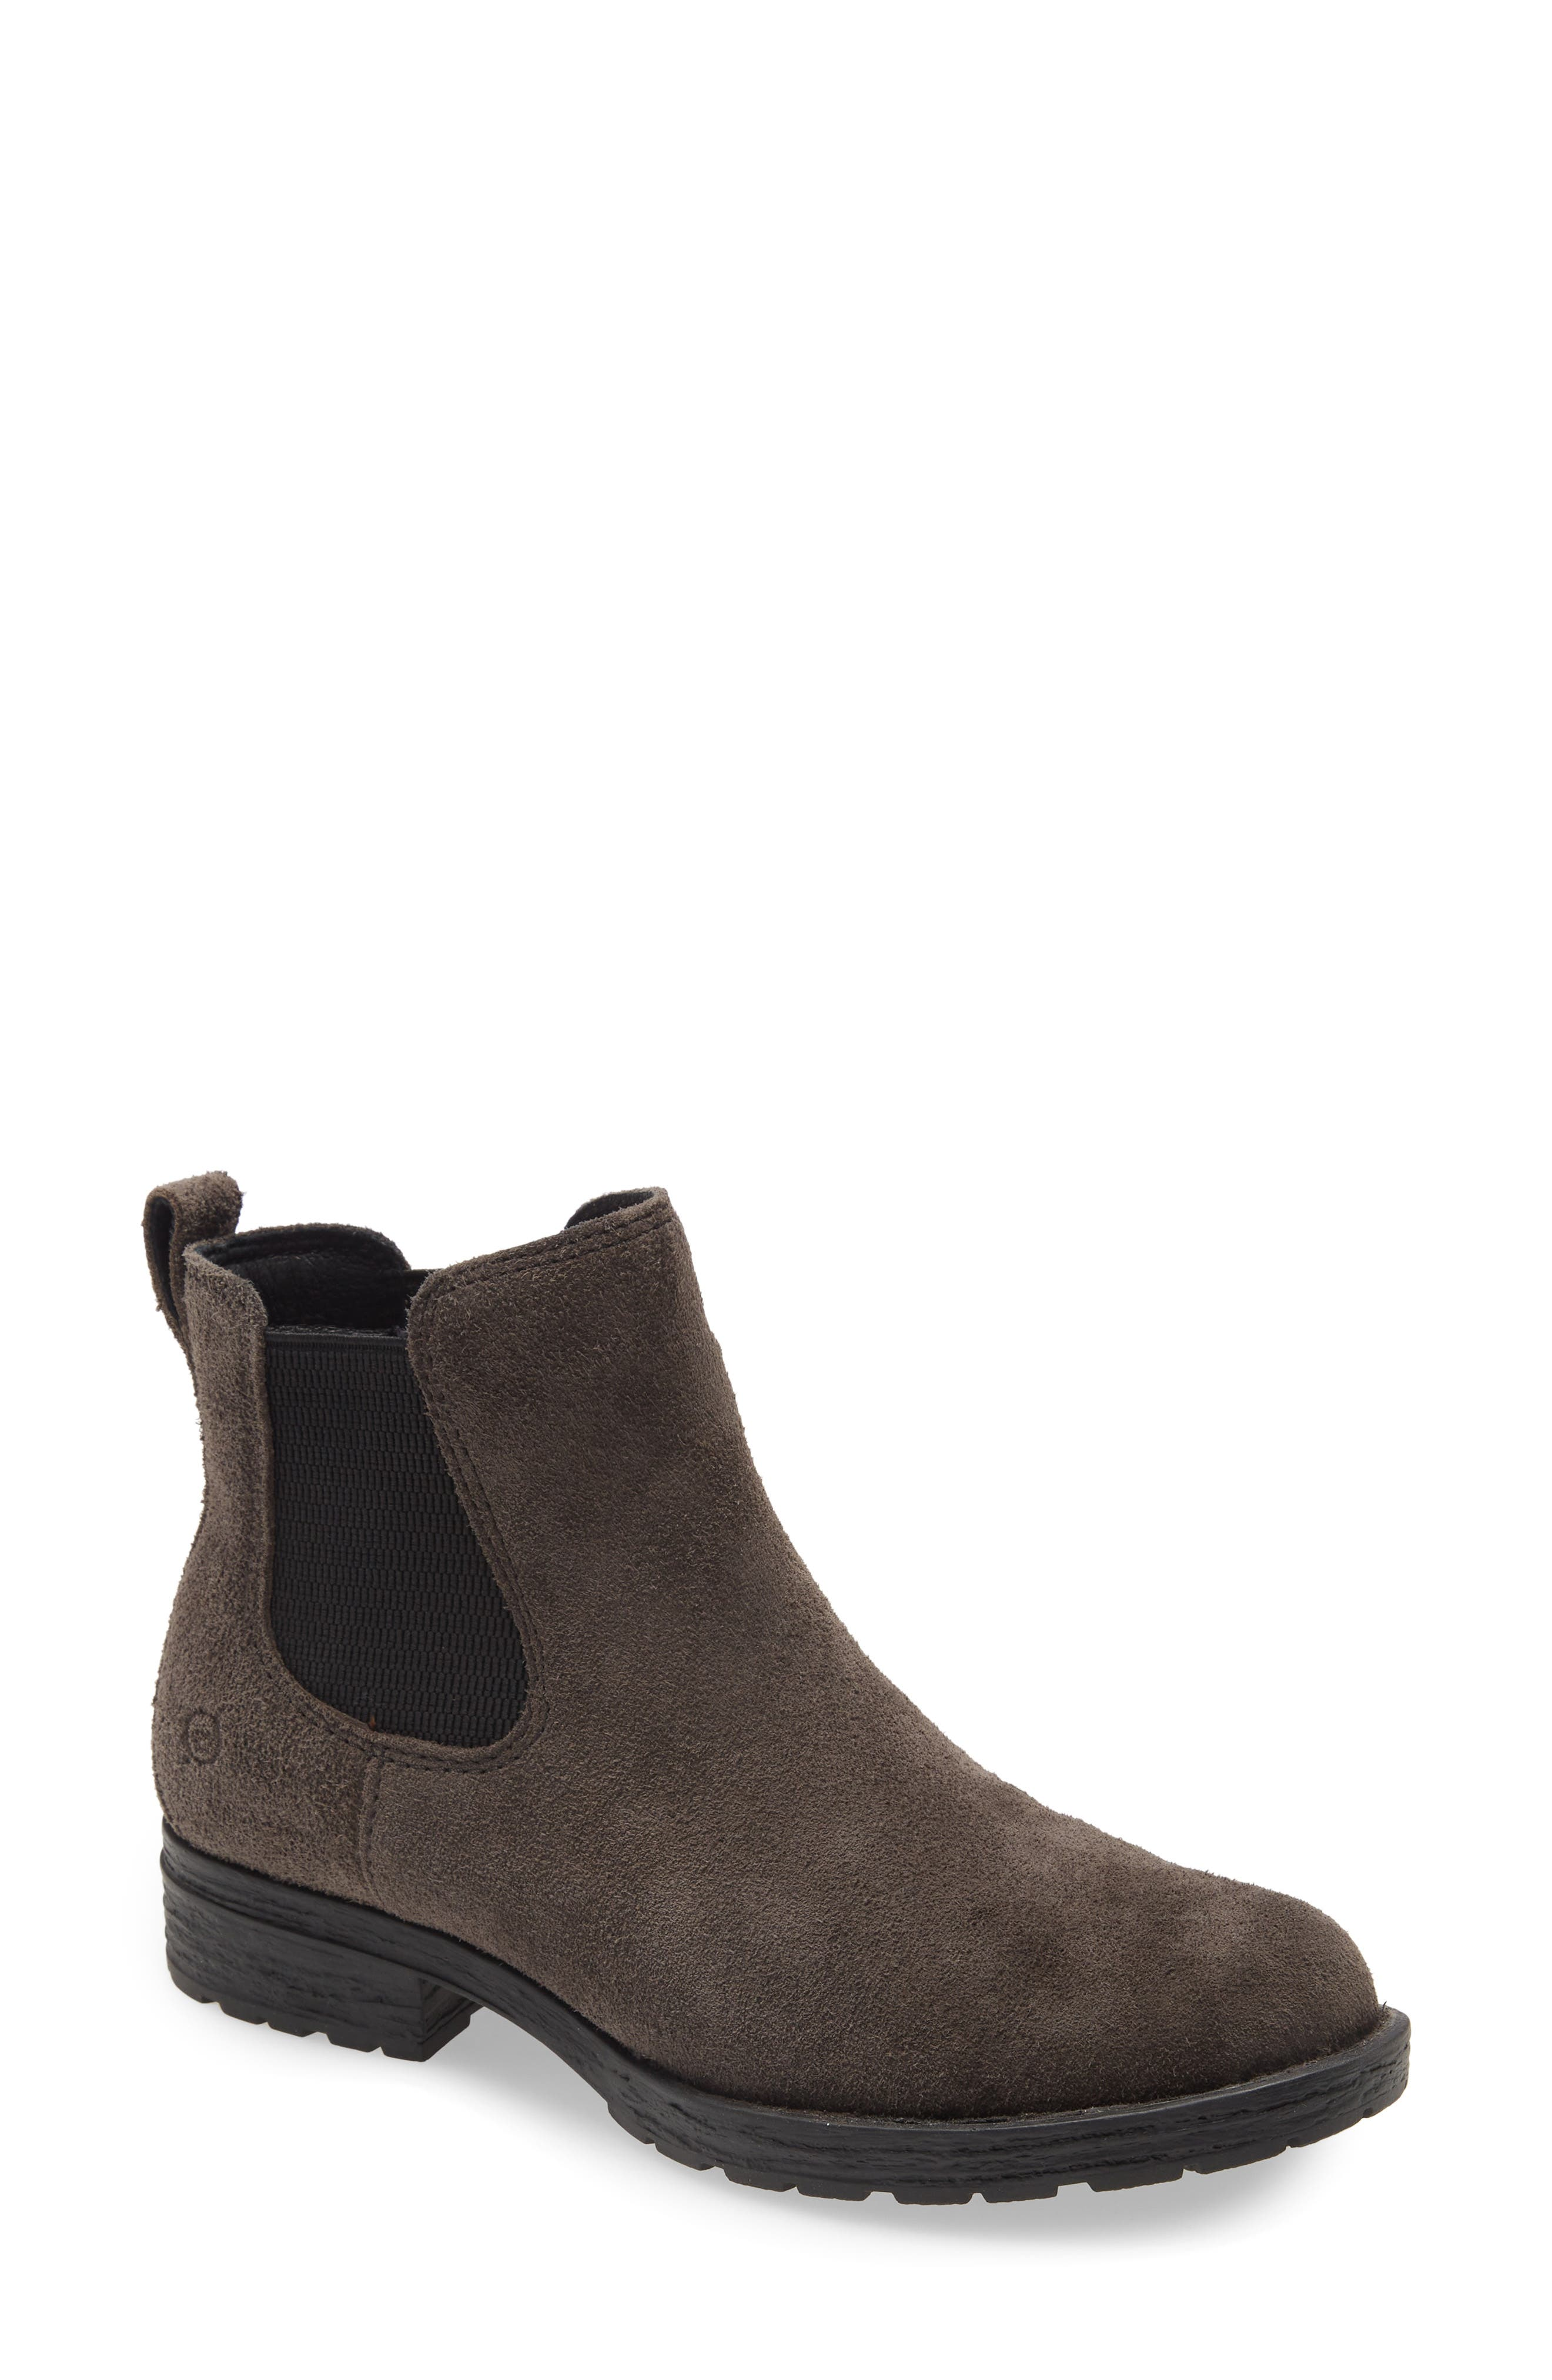 Women's B?rn Cove Waterproof Chelsea Boot